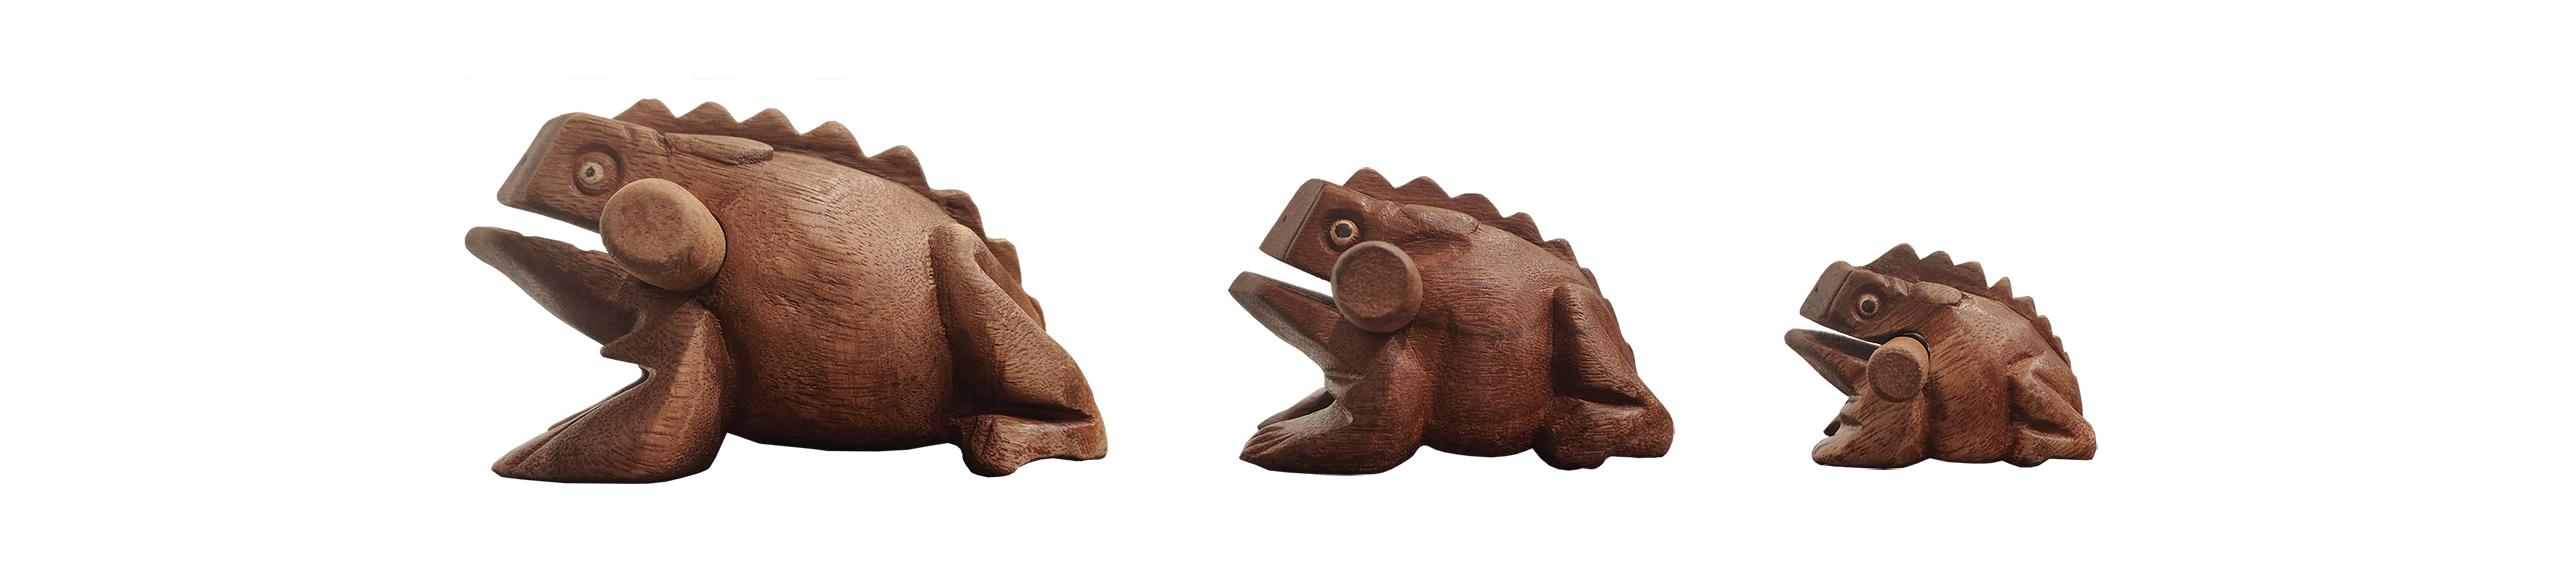 frog-lineup.jpg